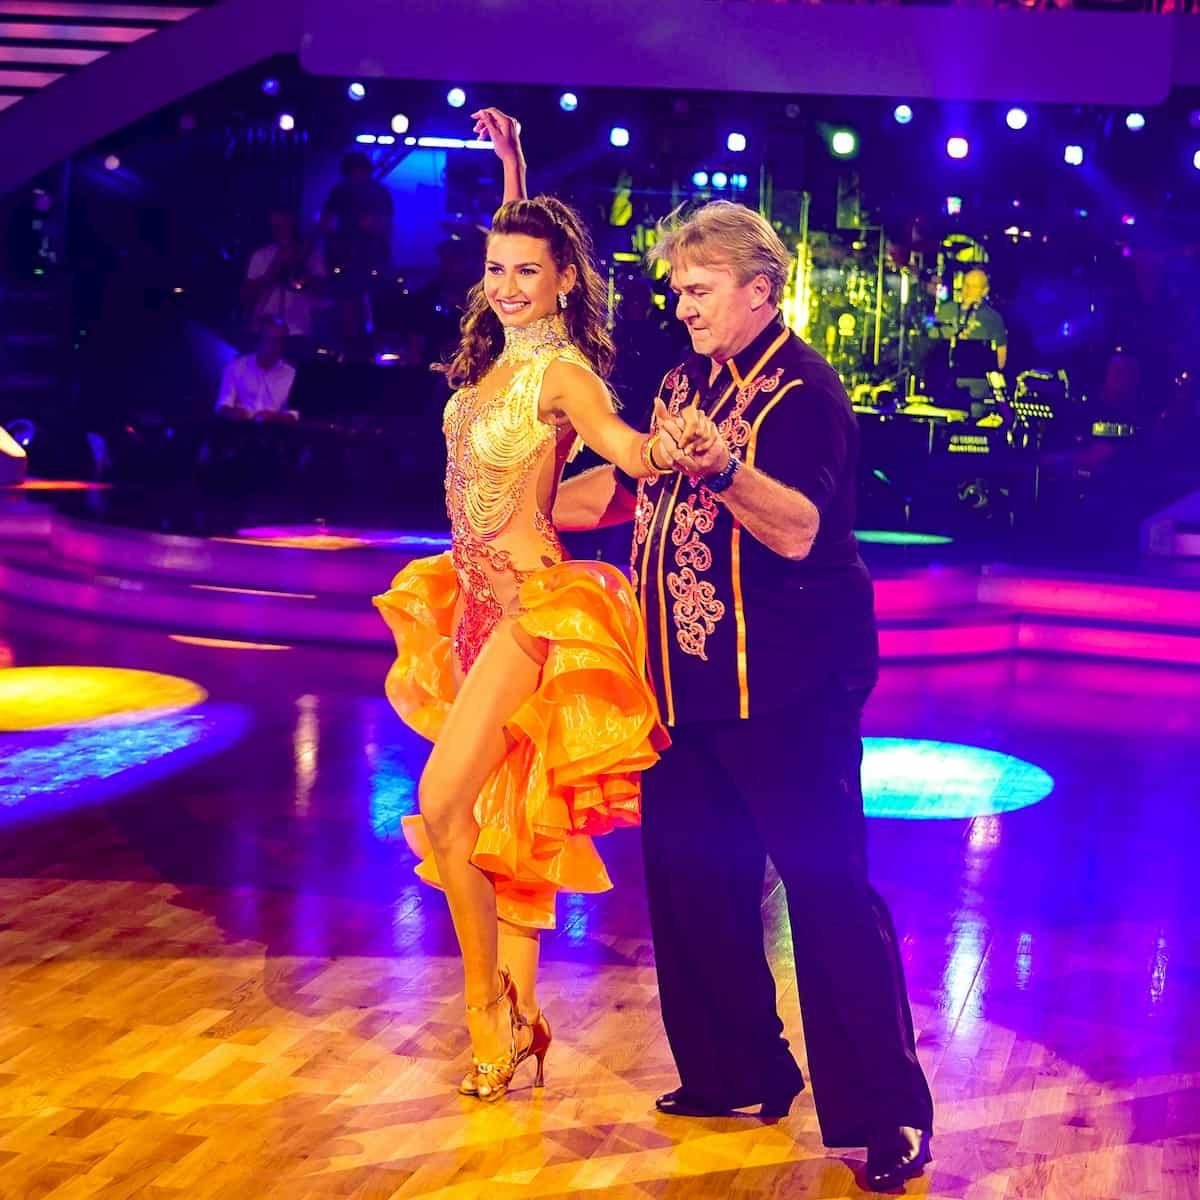 Andreas Ogris – Vesela Dimova bei den Dancing Stars am 25.9.2020